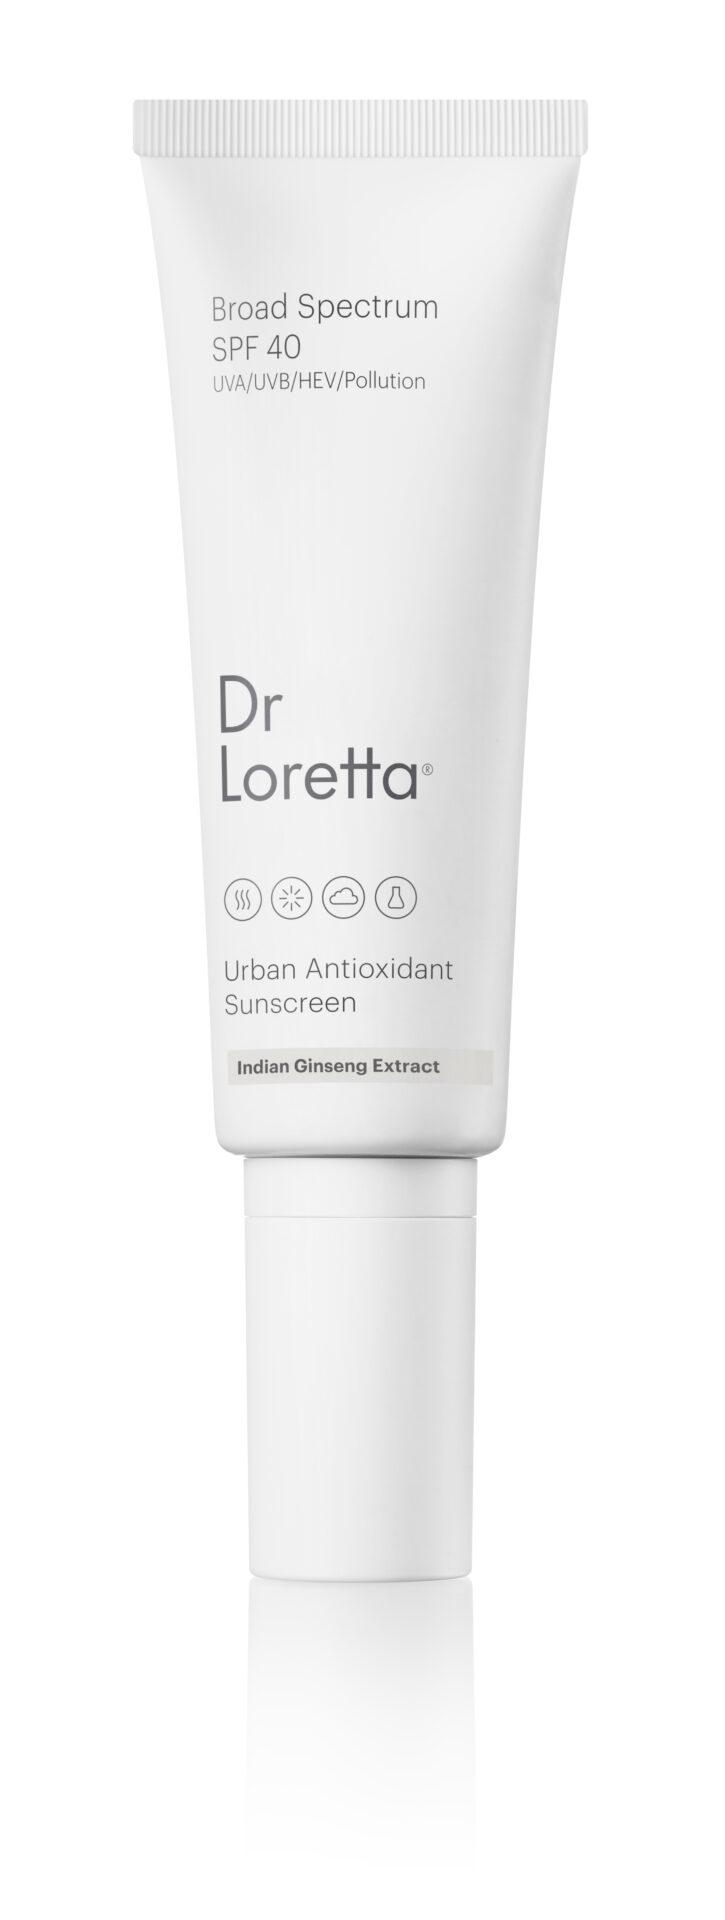 UrbanAntioxidantSunscreen